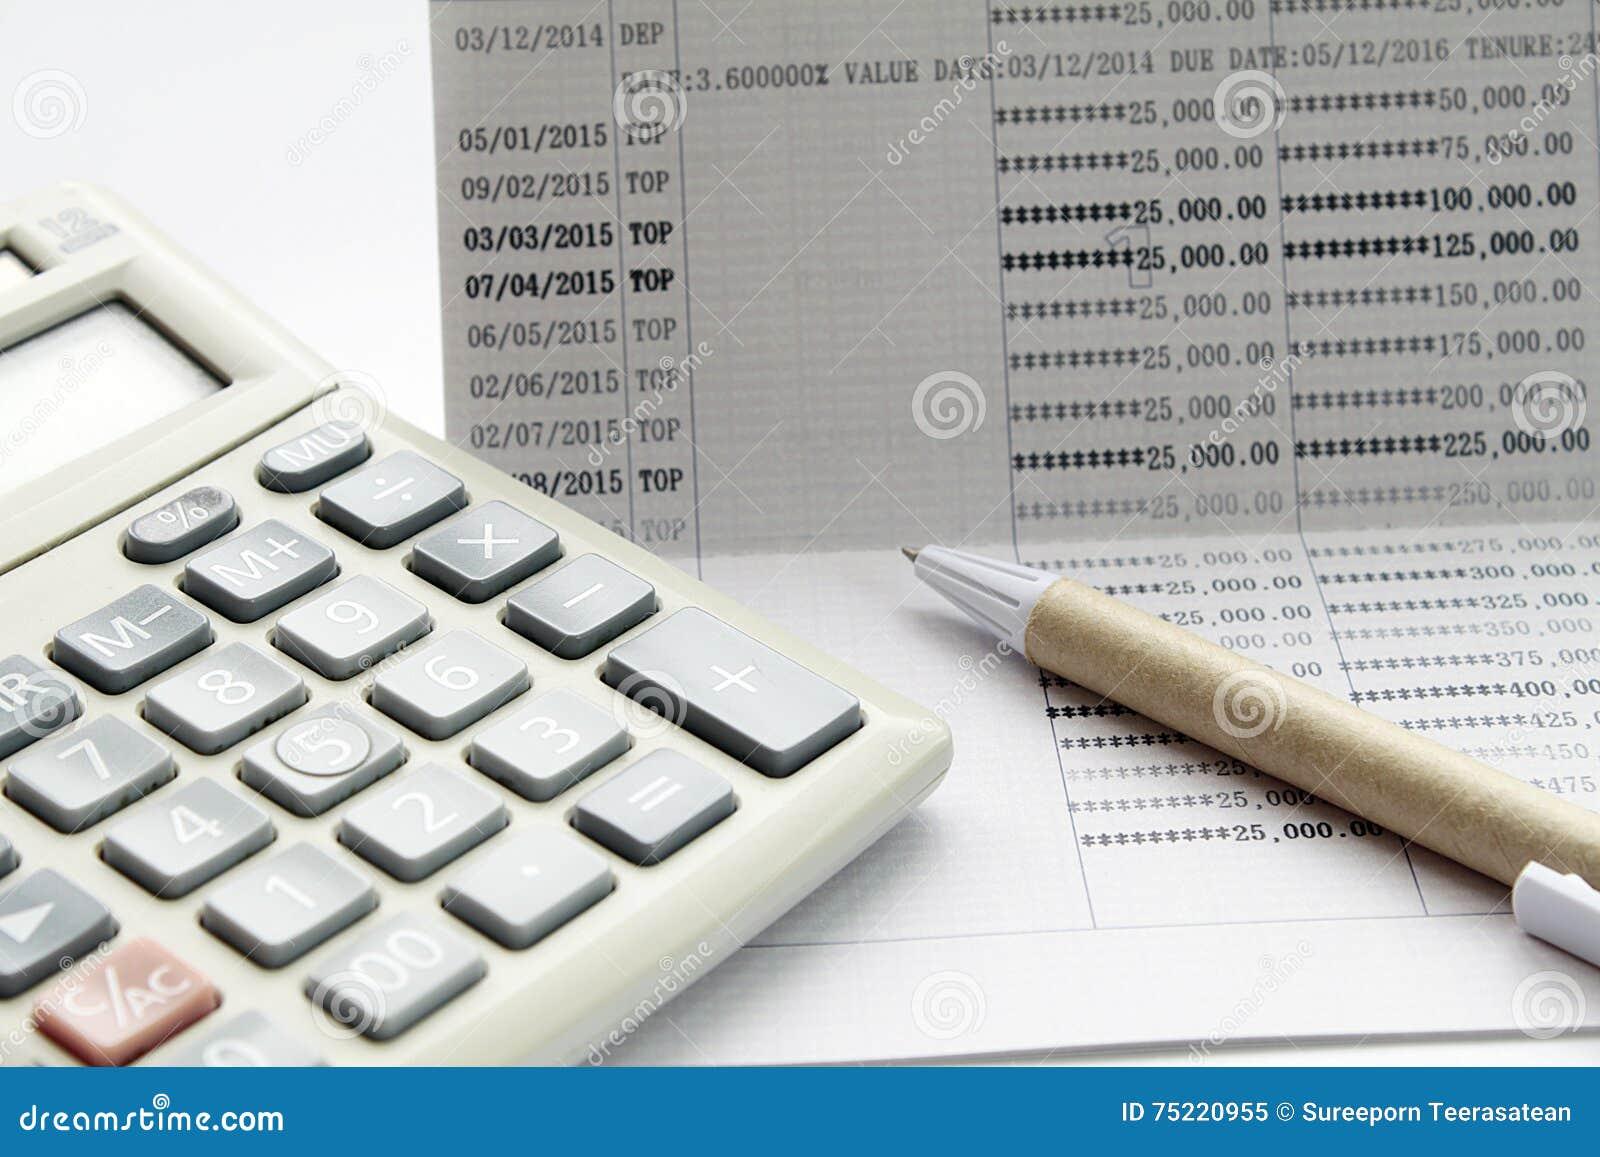 Pen And Calculator On Savings Account Passbook Photo Image – Savings Account Calculator